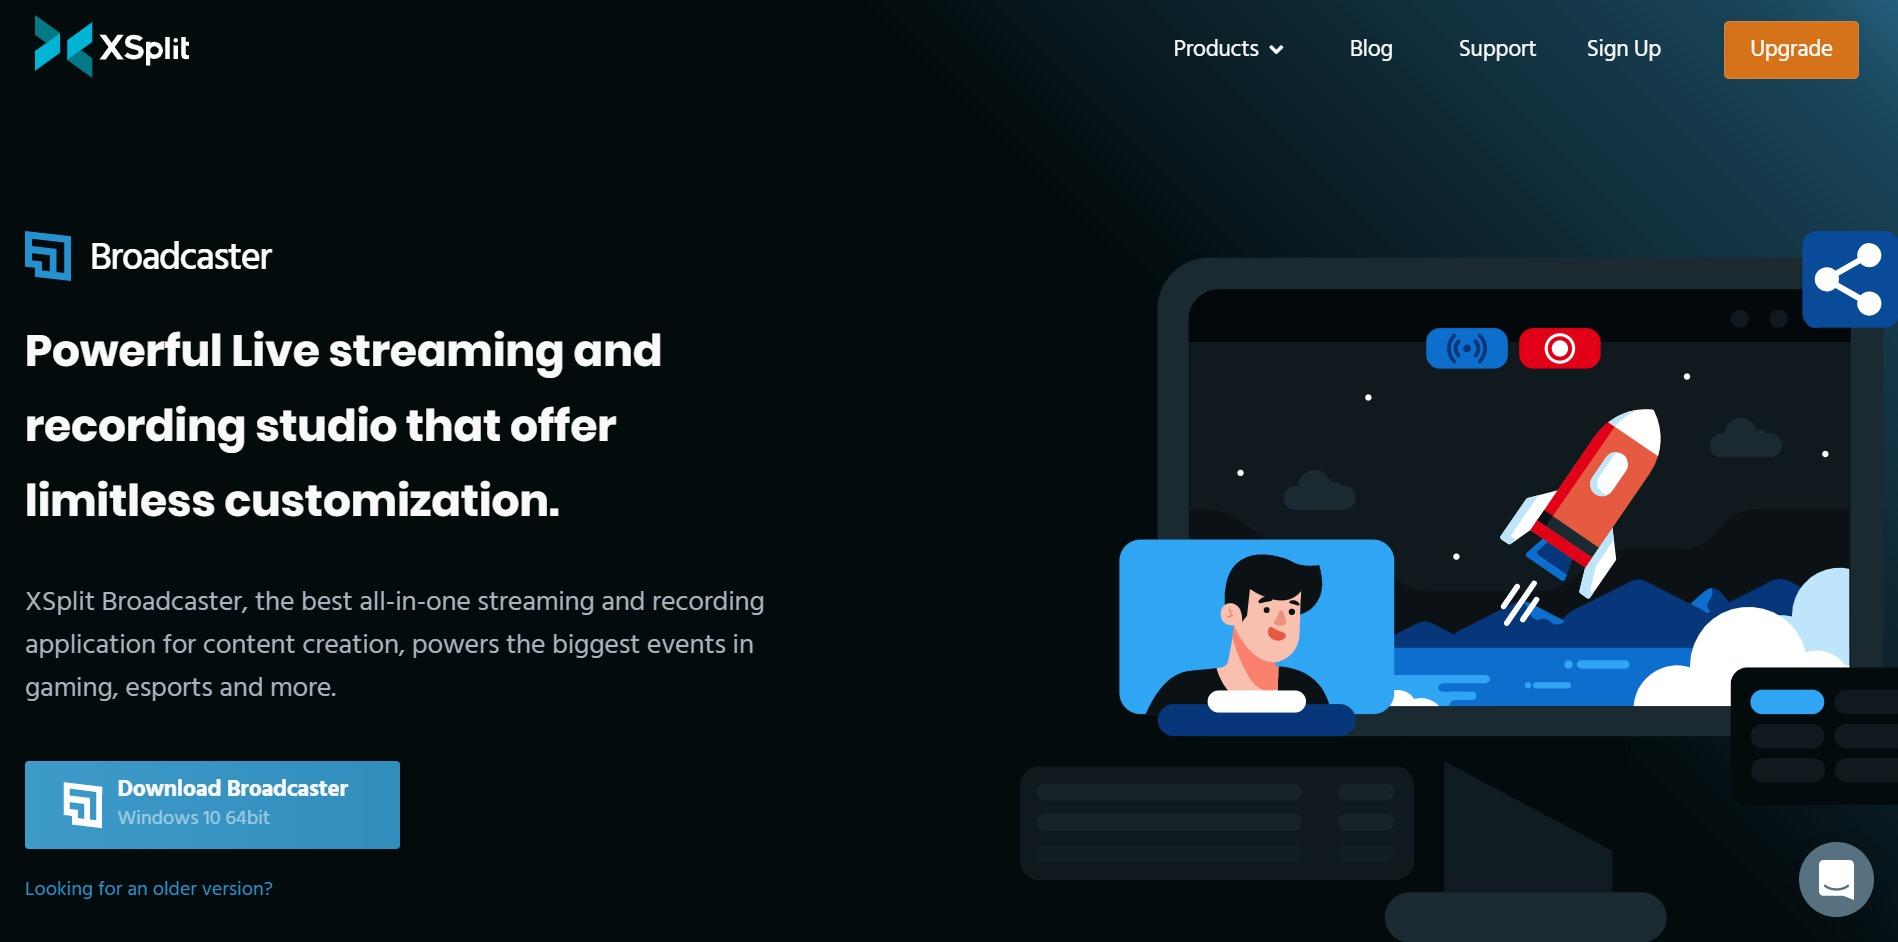 XSplit Broadcaster main page